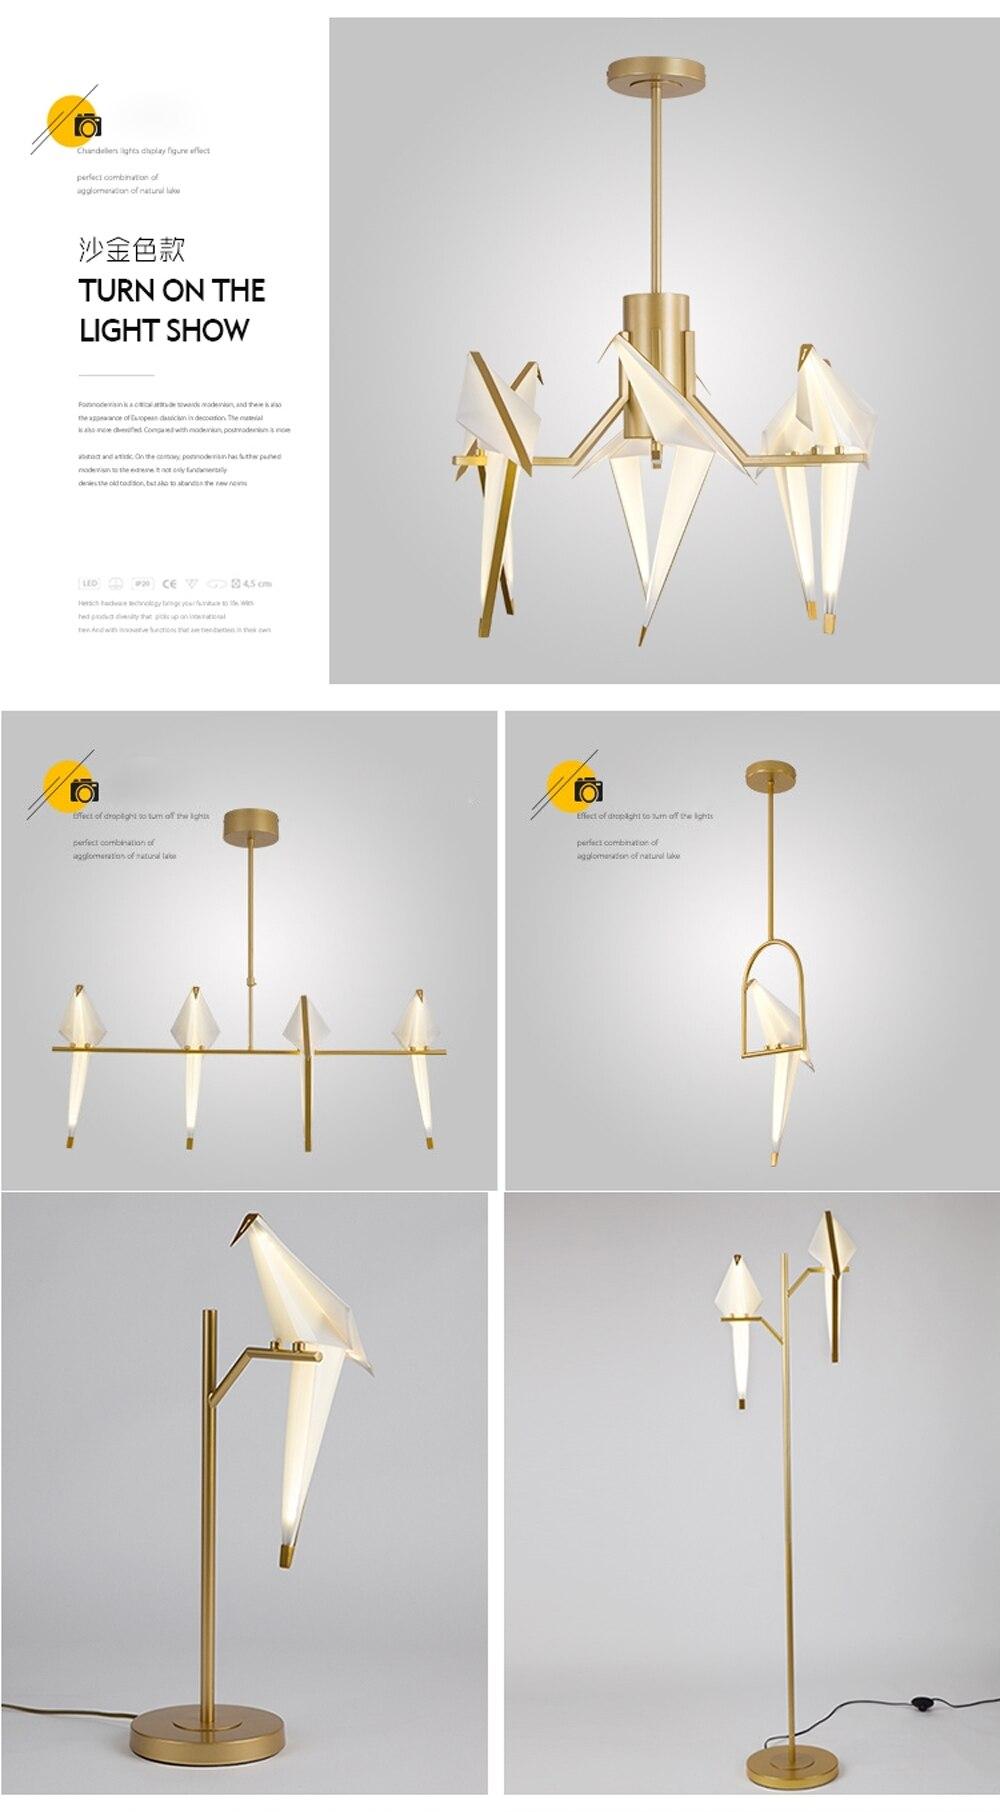 H9420b0f61f874753be0595bbe003b713t - LED Postmodern Iron Acryl Love Bird LED Lamp LED Light Wall lamp Wall Light Wall Sconce For Bedroom Corridor